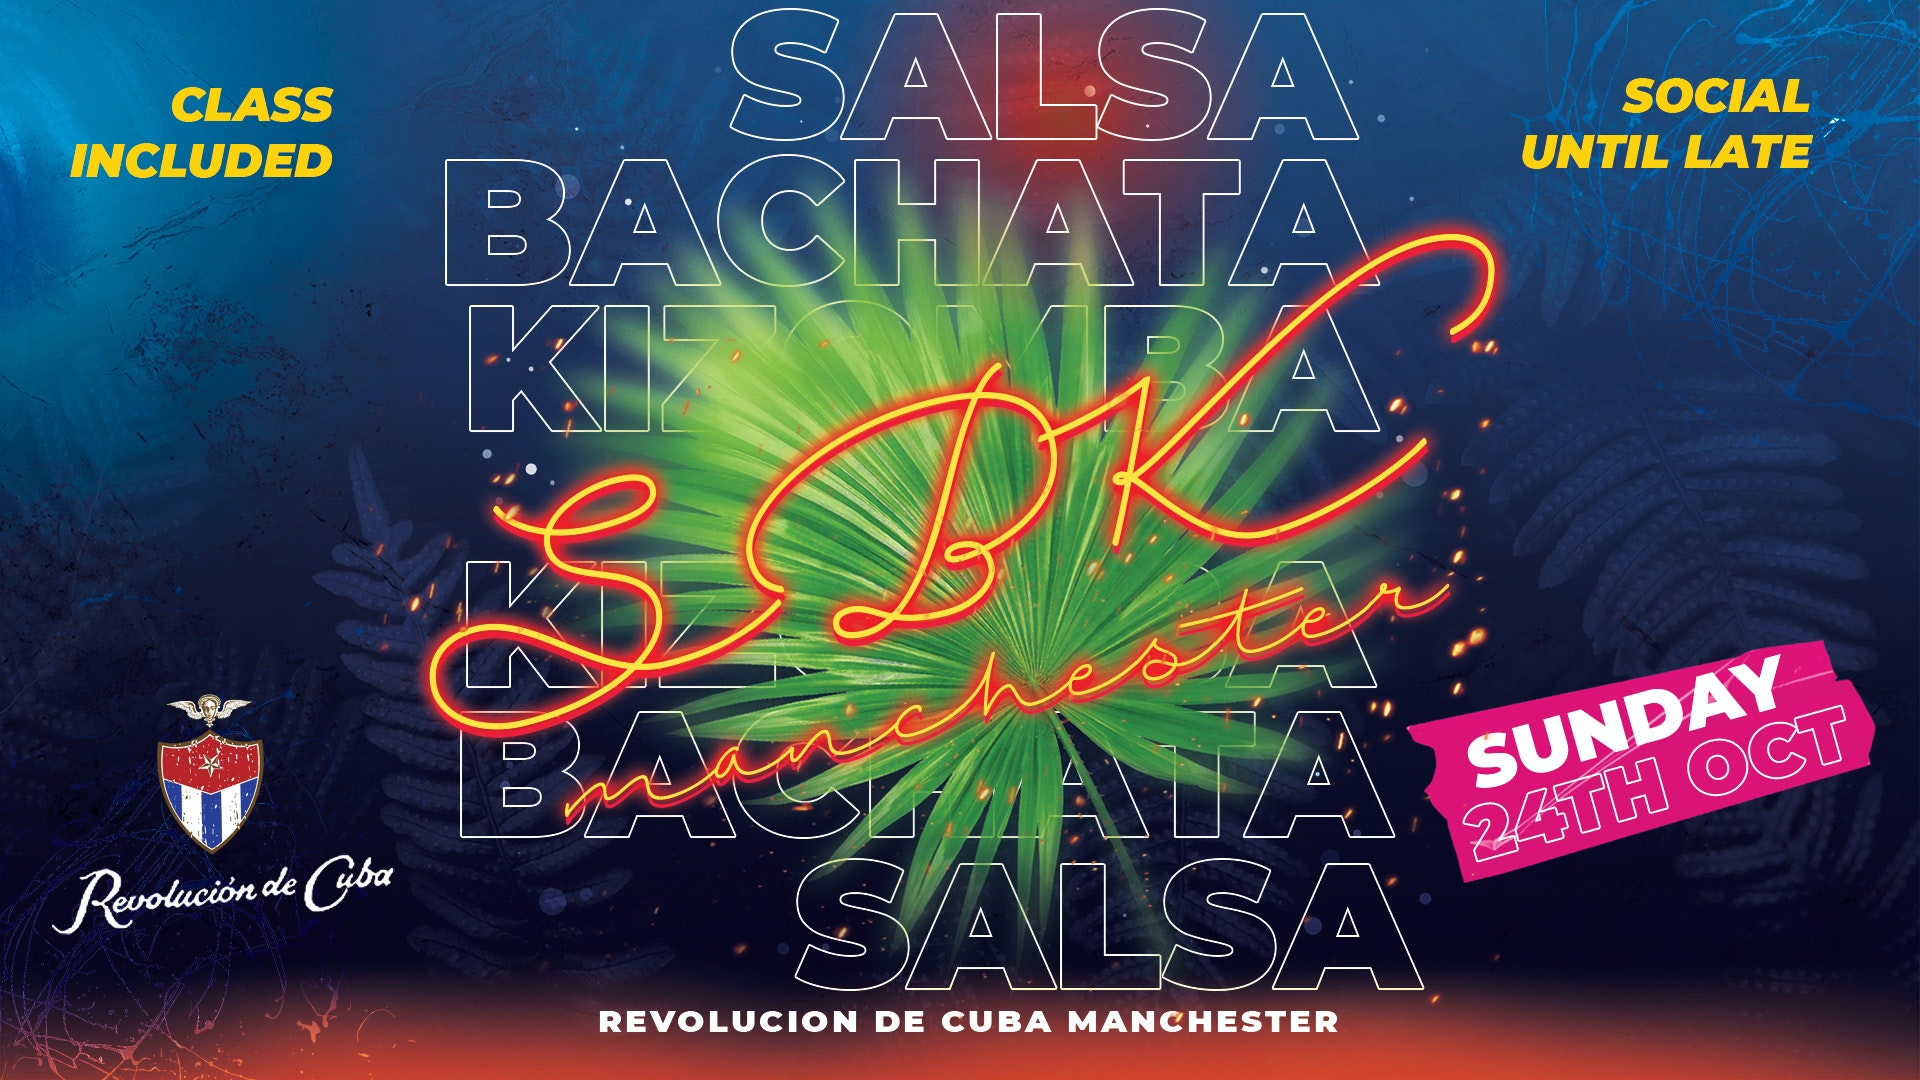 SBK MANCHESTER   Sunday 24th October – Revolucion de Cuba